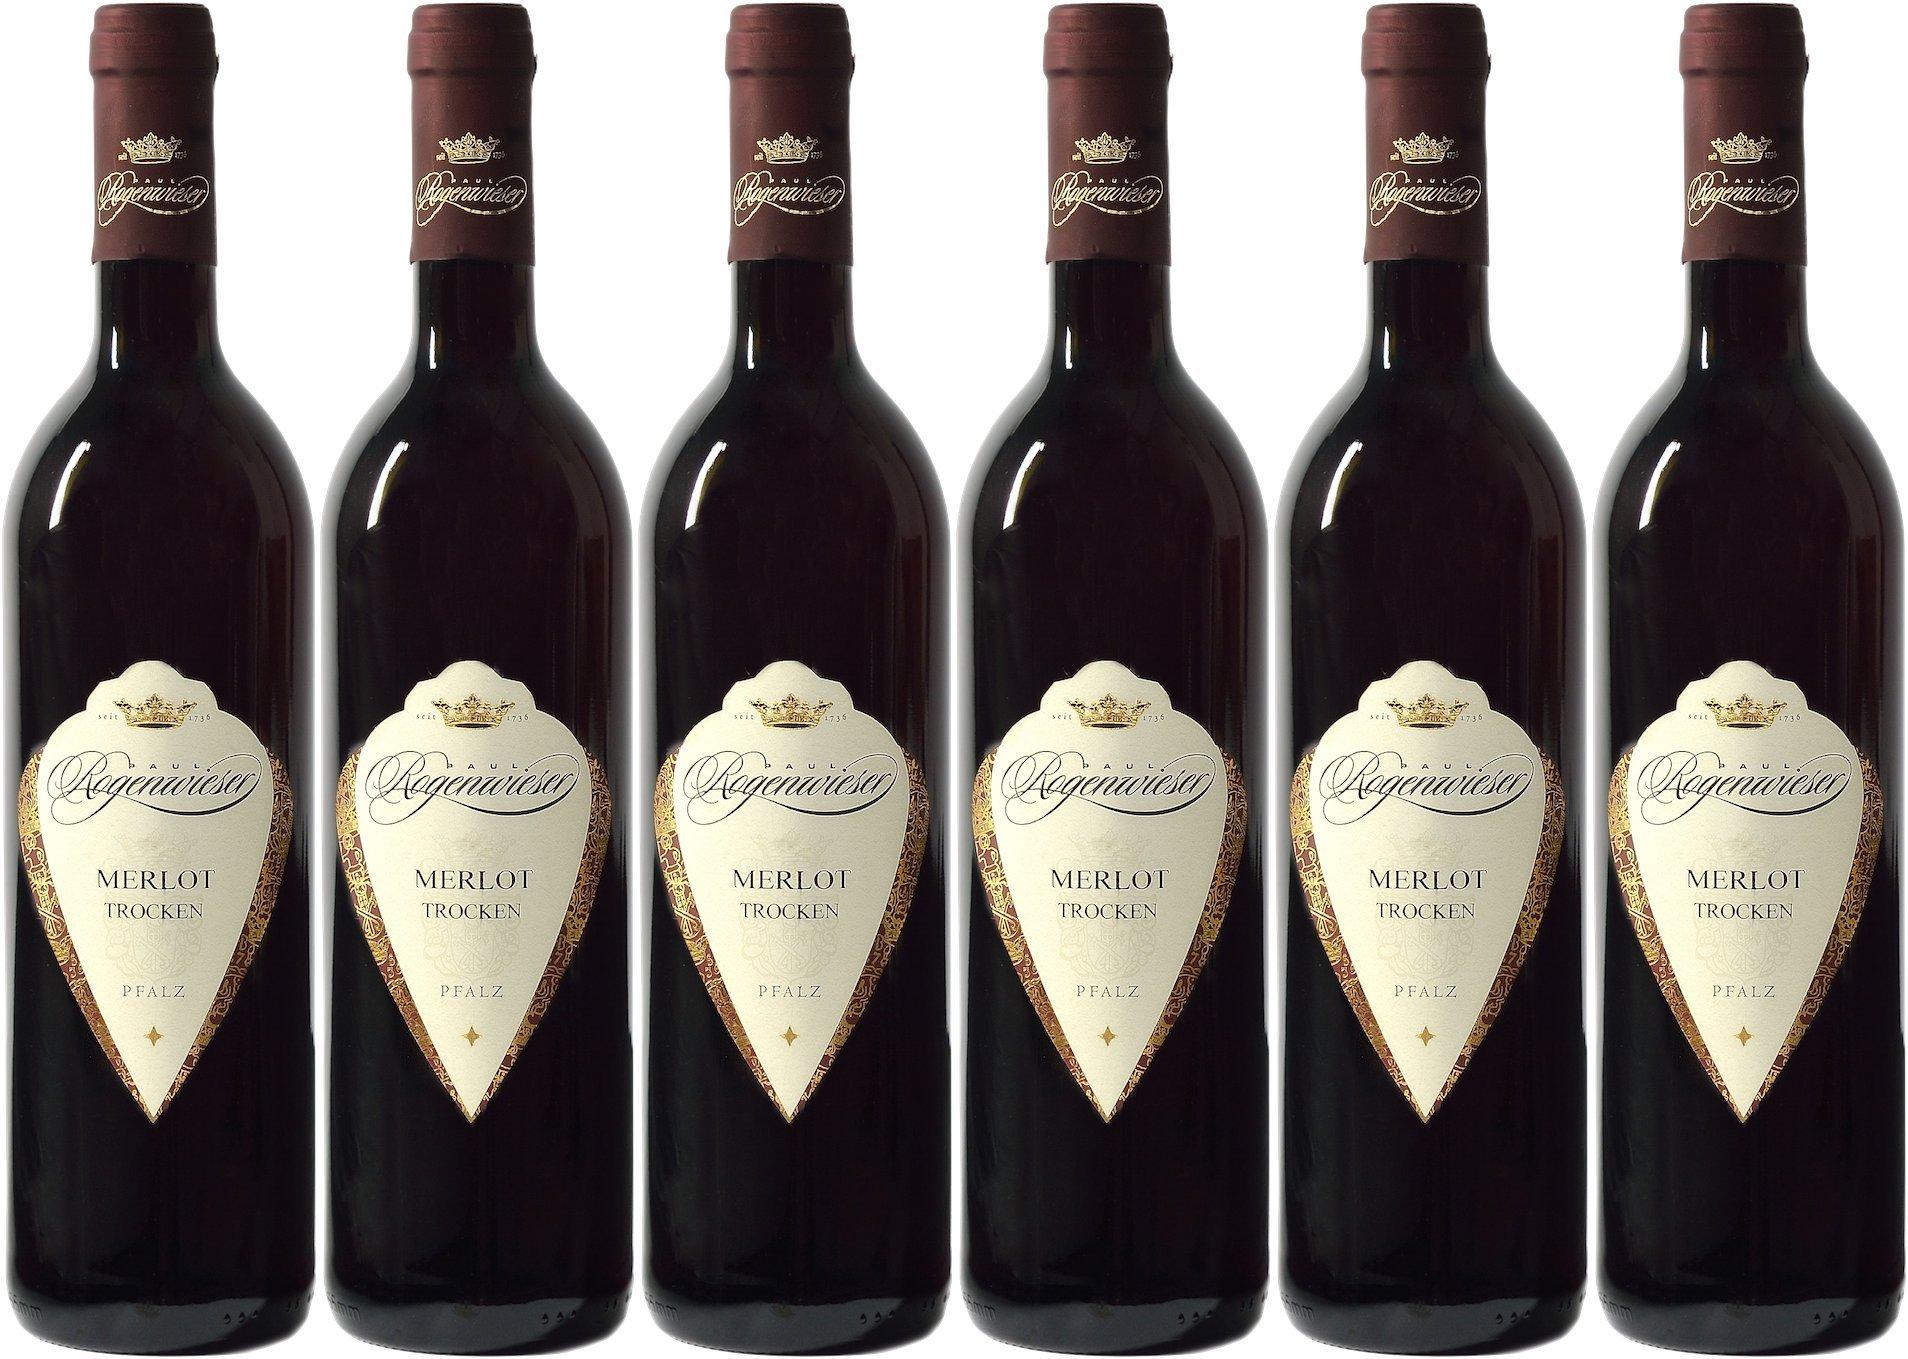 Weingut-Rogenwieser-Kirchheimer-Kreuz-Merlot-Rotwein-QbA-trocken-6-x-075L